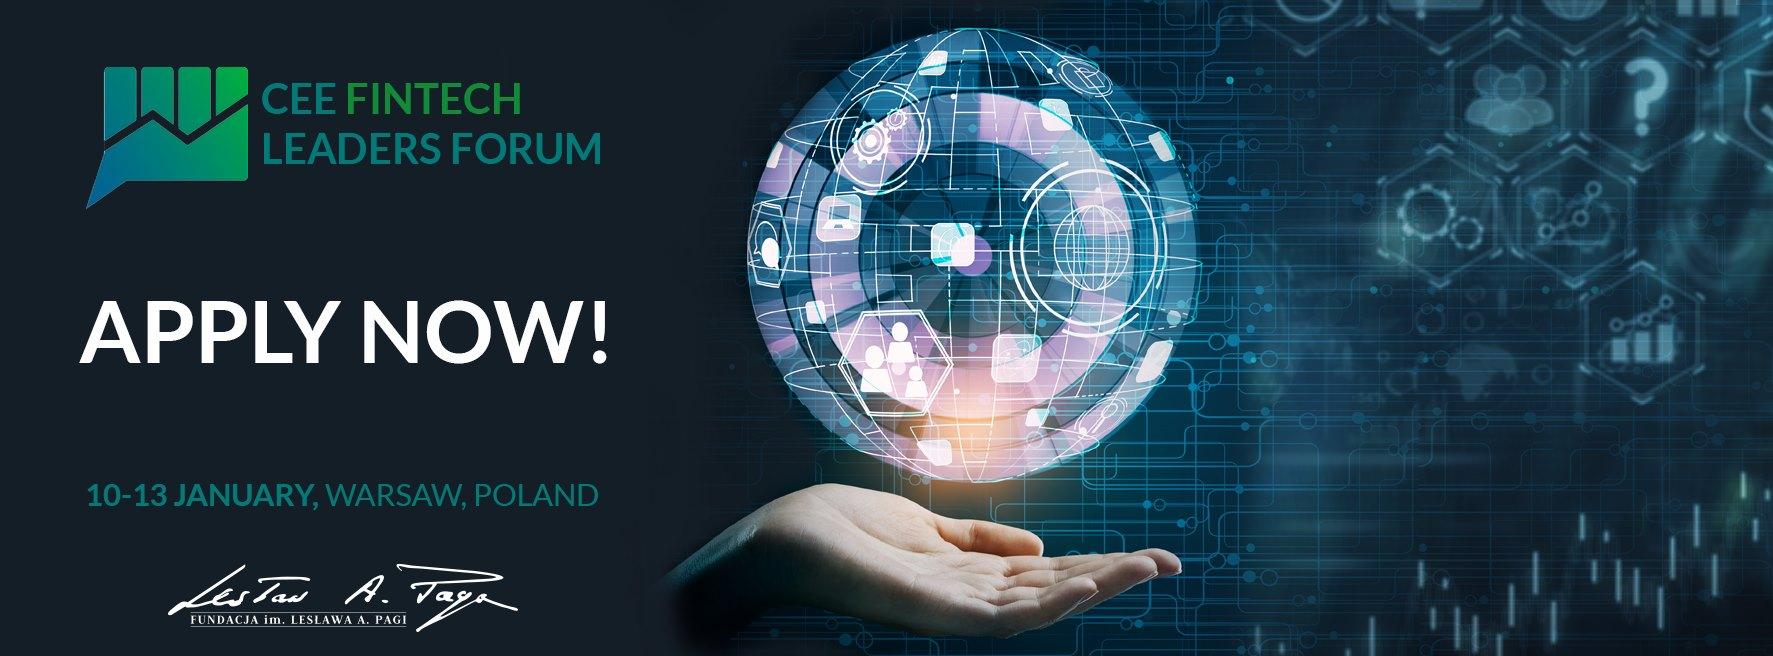 CEE Fintech Leaders Forum